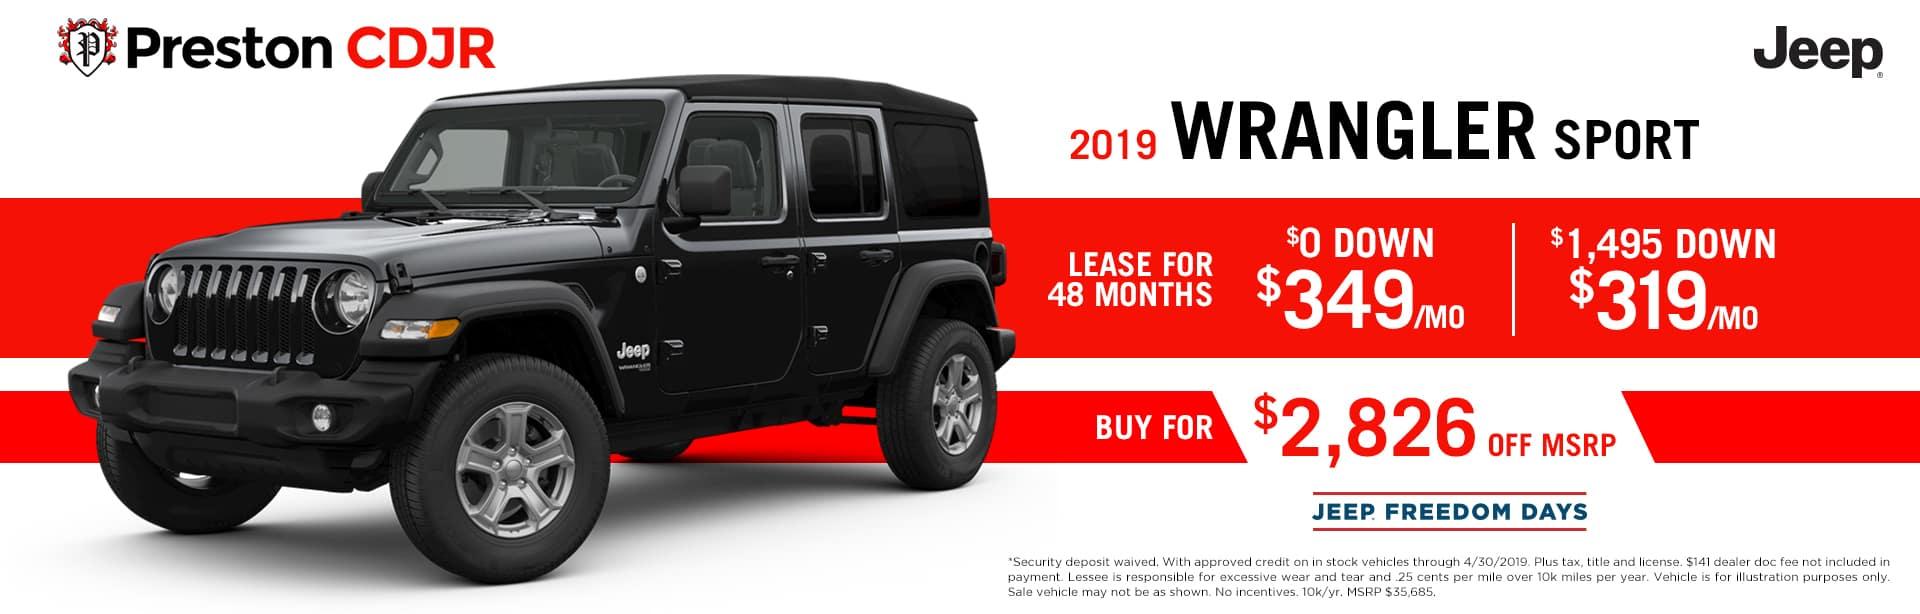 deal jeep wrangler sport